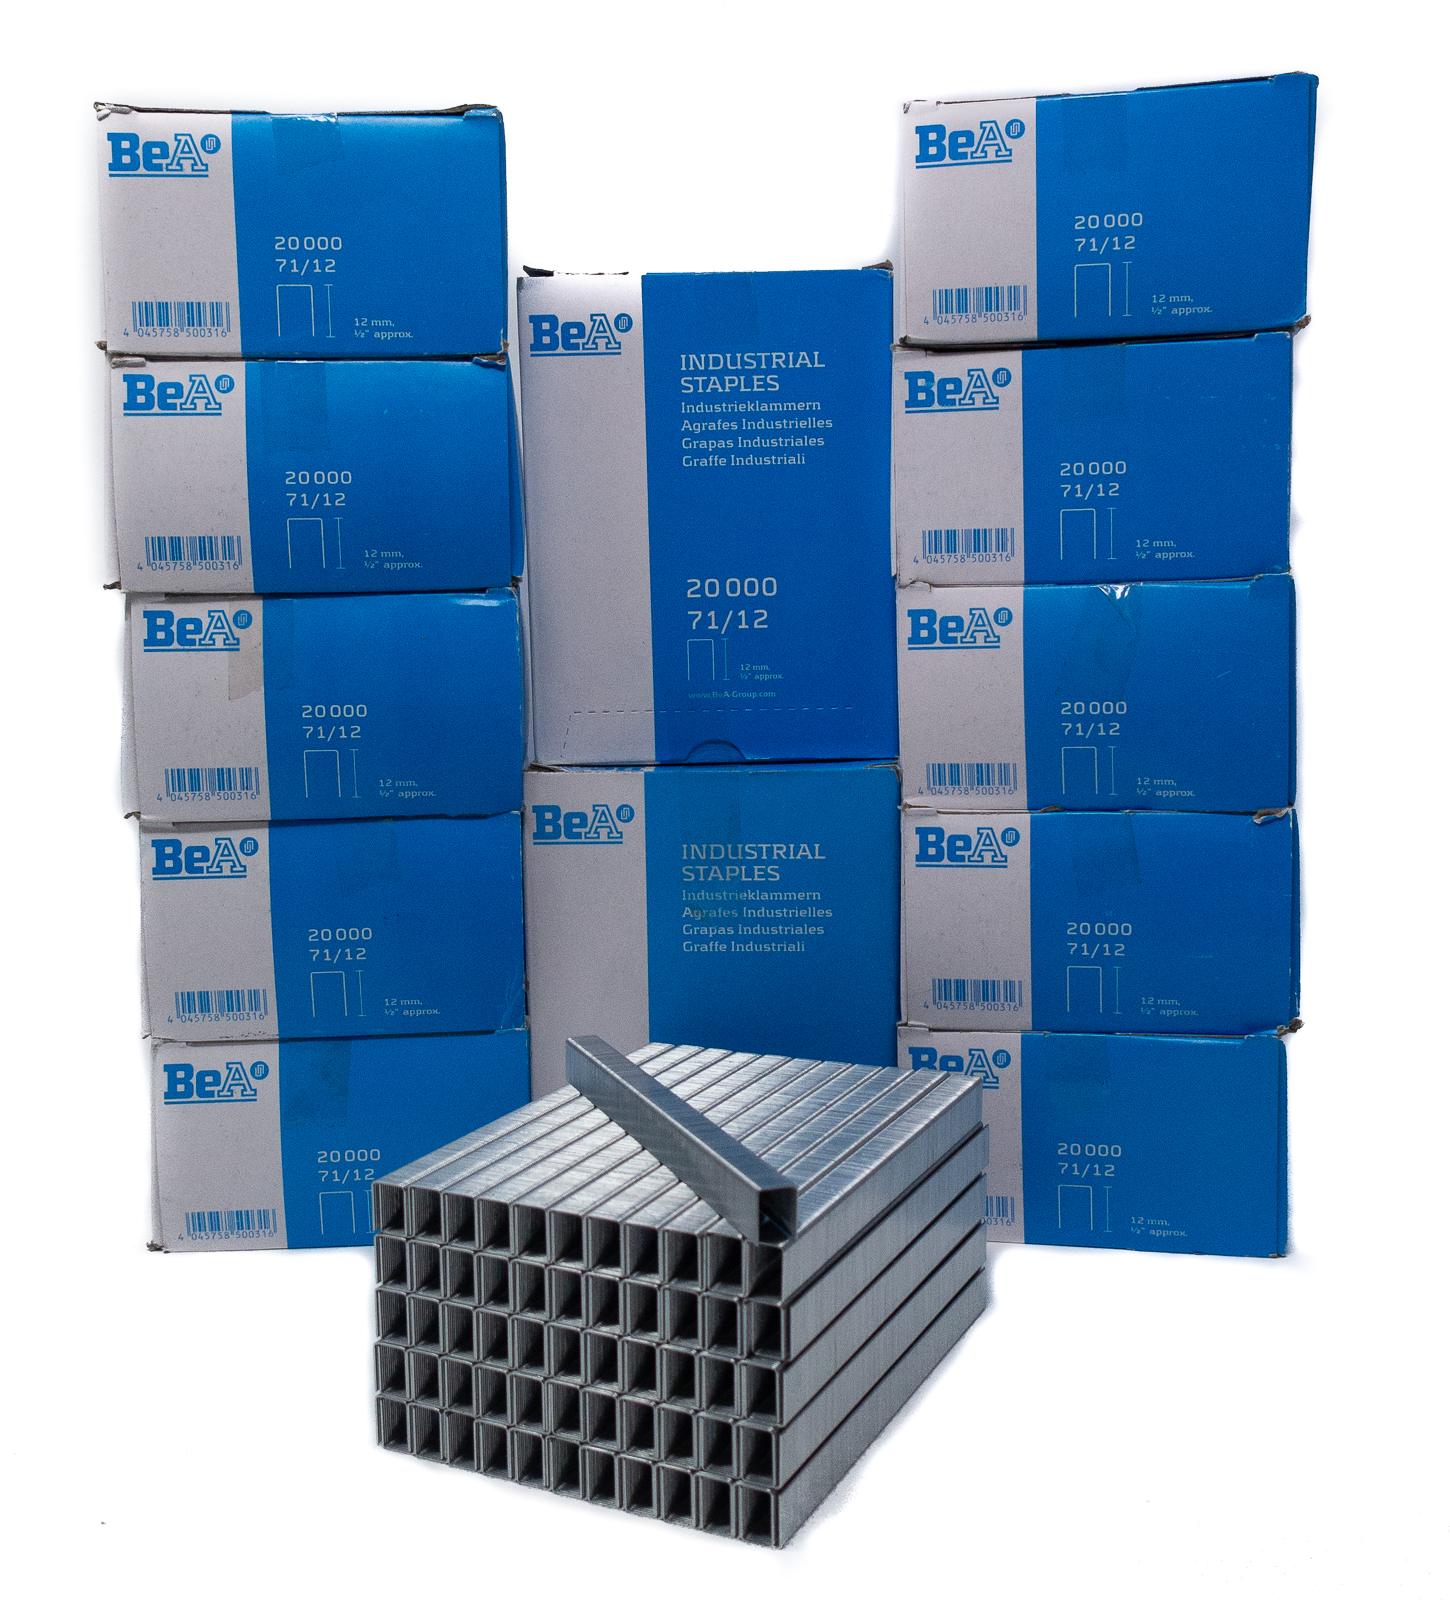 BeA 10000125 Series 71//12 Galvanized Steel Staples 1//2 deep 20,000 per box